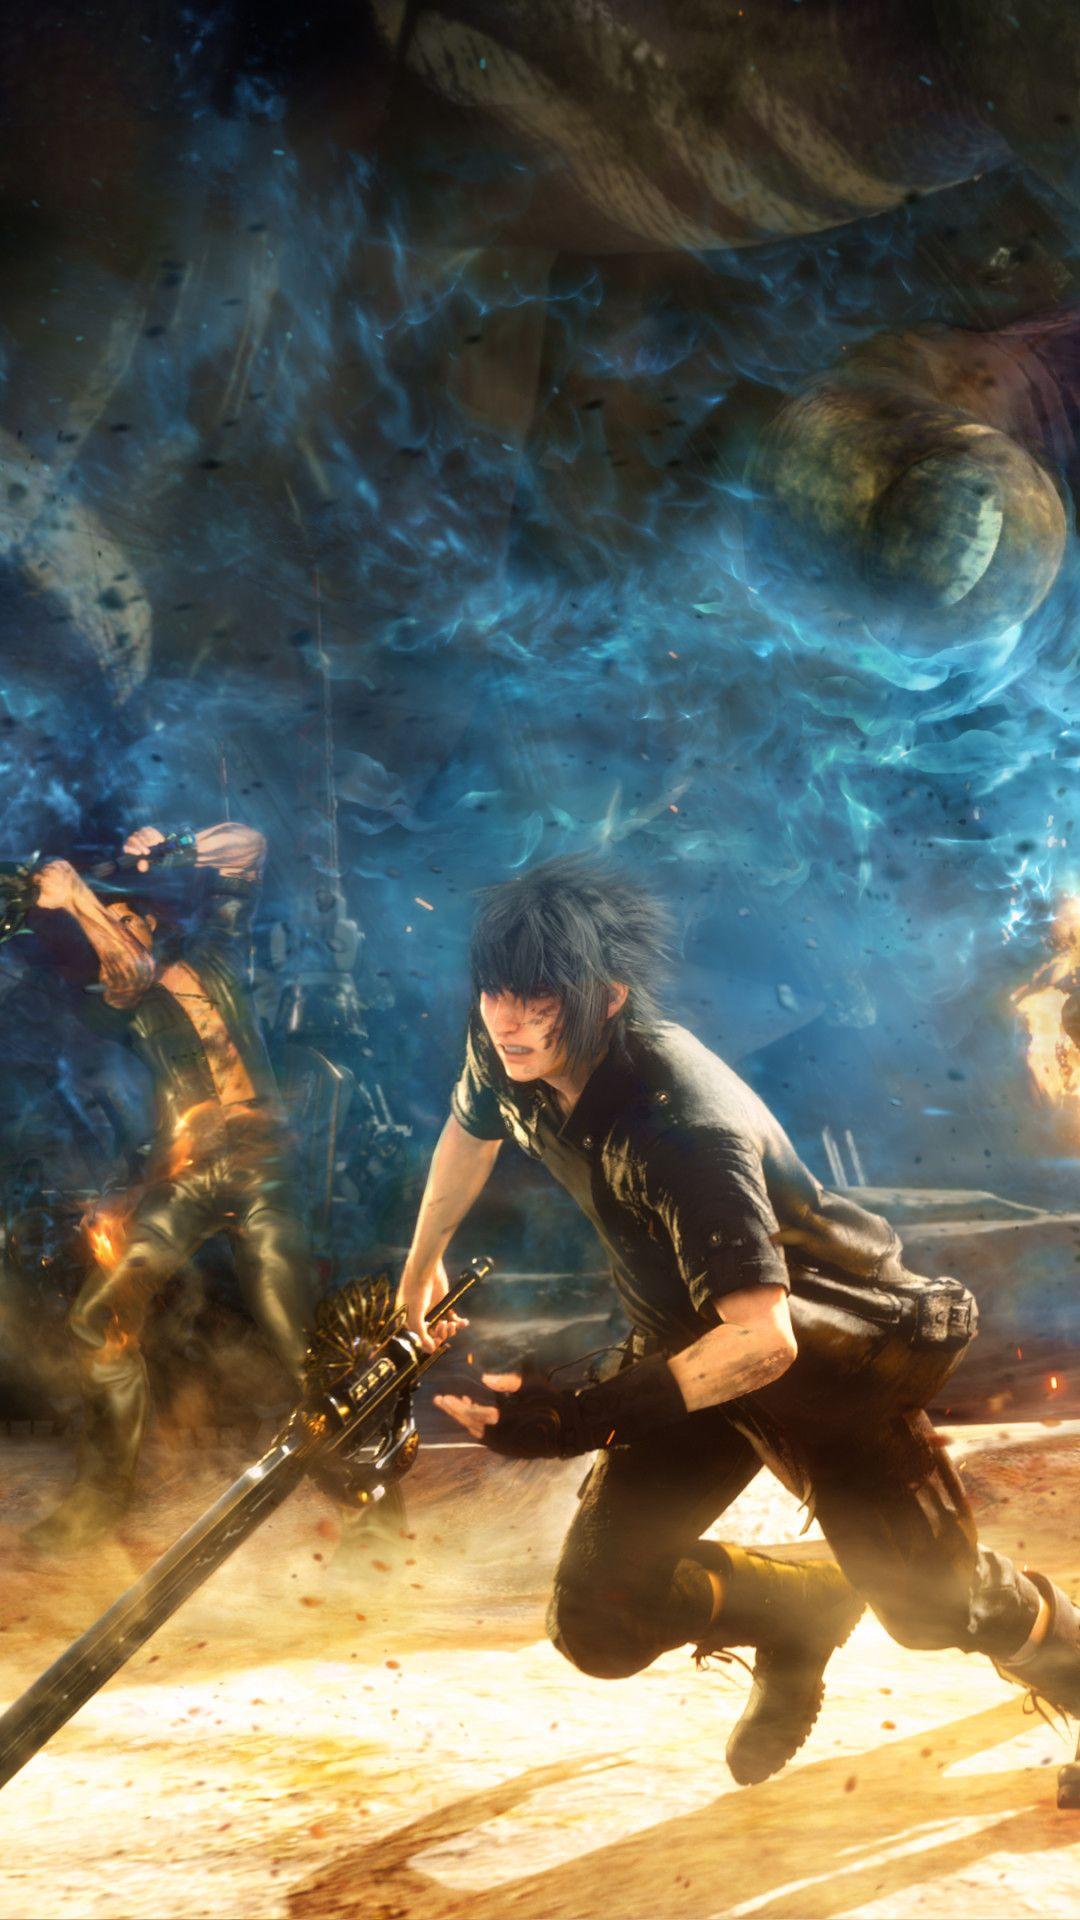 Lightning Ffxv Wallpaper Download Final Fantasy Wallpaper Hd Final Fantasy Logo Final Fantasy